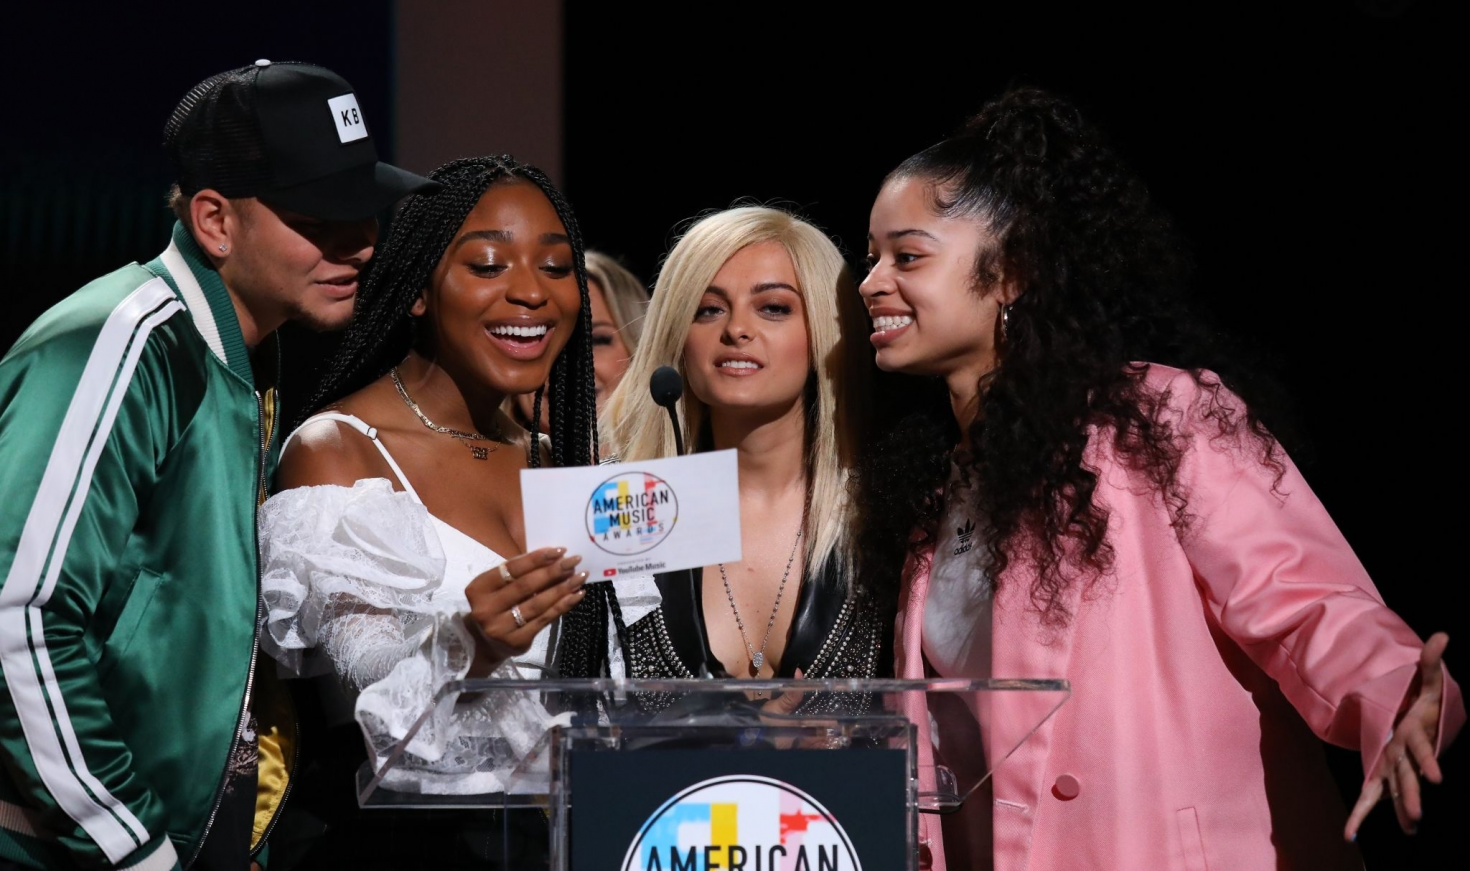 Bebe Rexha 2018 : Bebe Rexha: 2018 American Music Awards Nominations Announcement -11